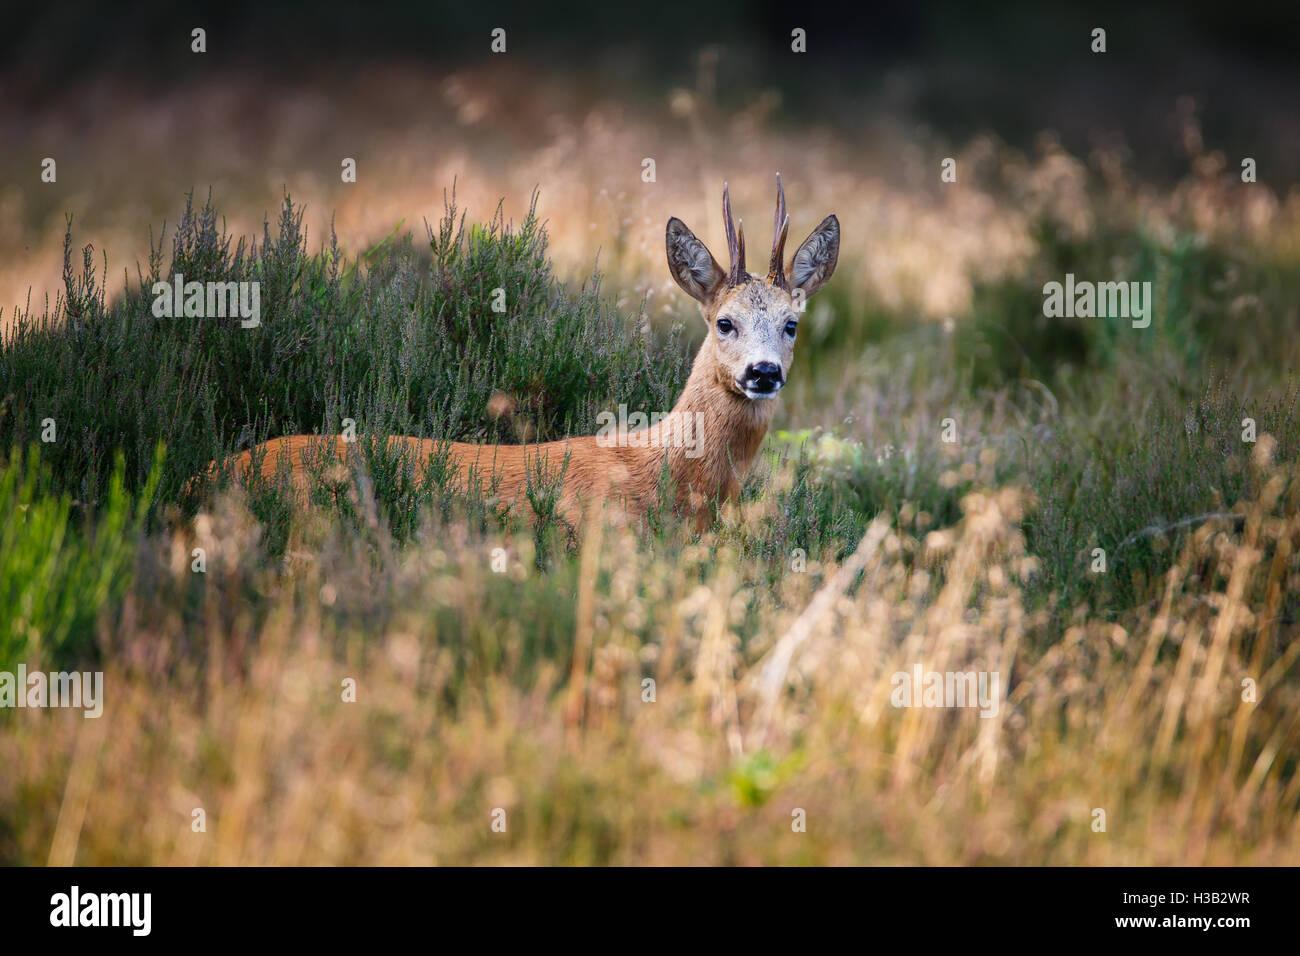 a roe deer buck - Stock Image